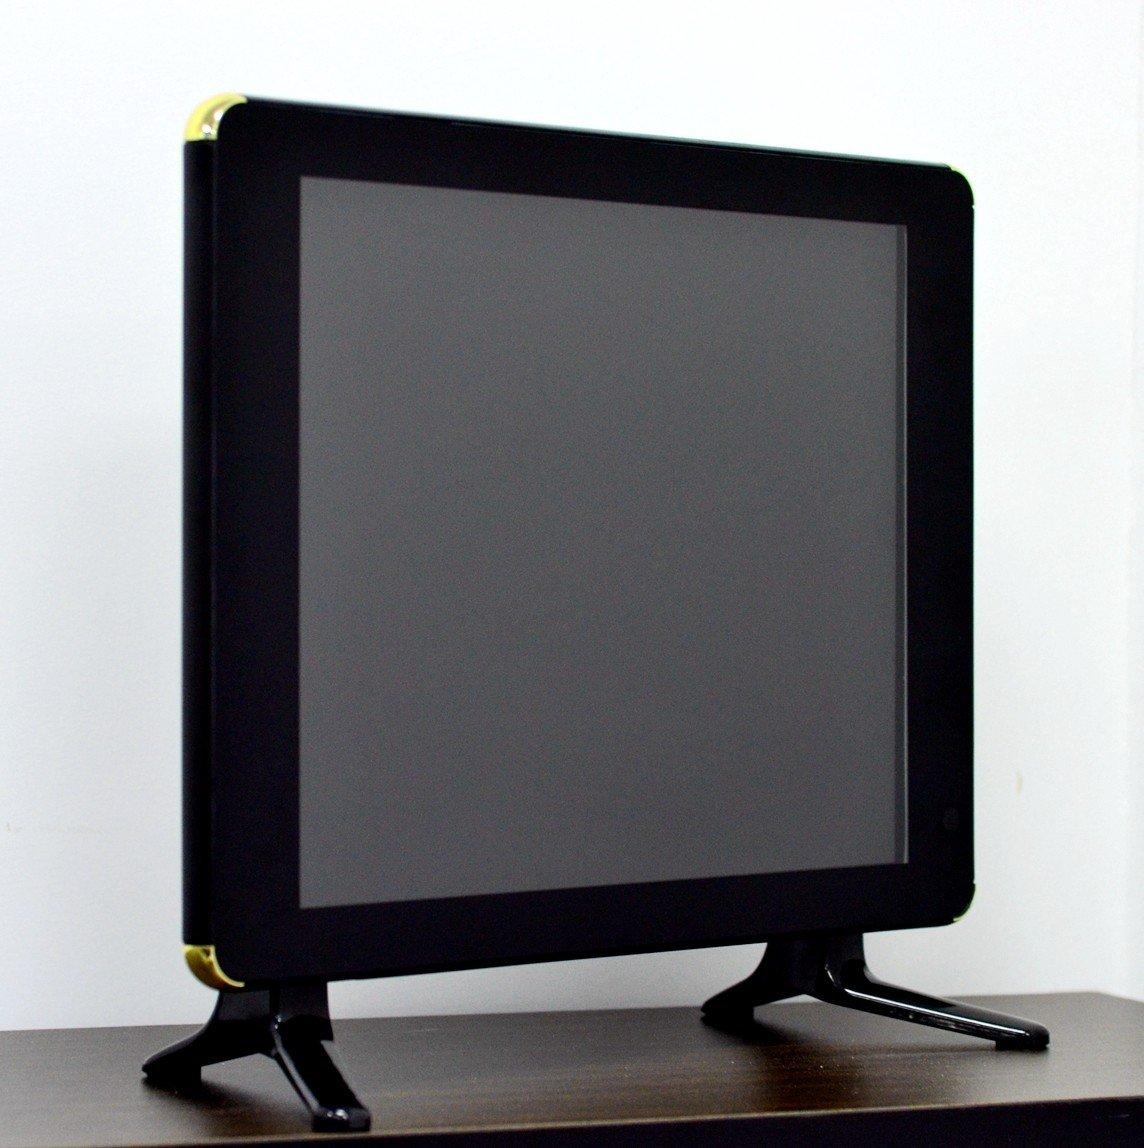 17 inch flat screen tv fashion design for tv screen-3